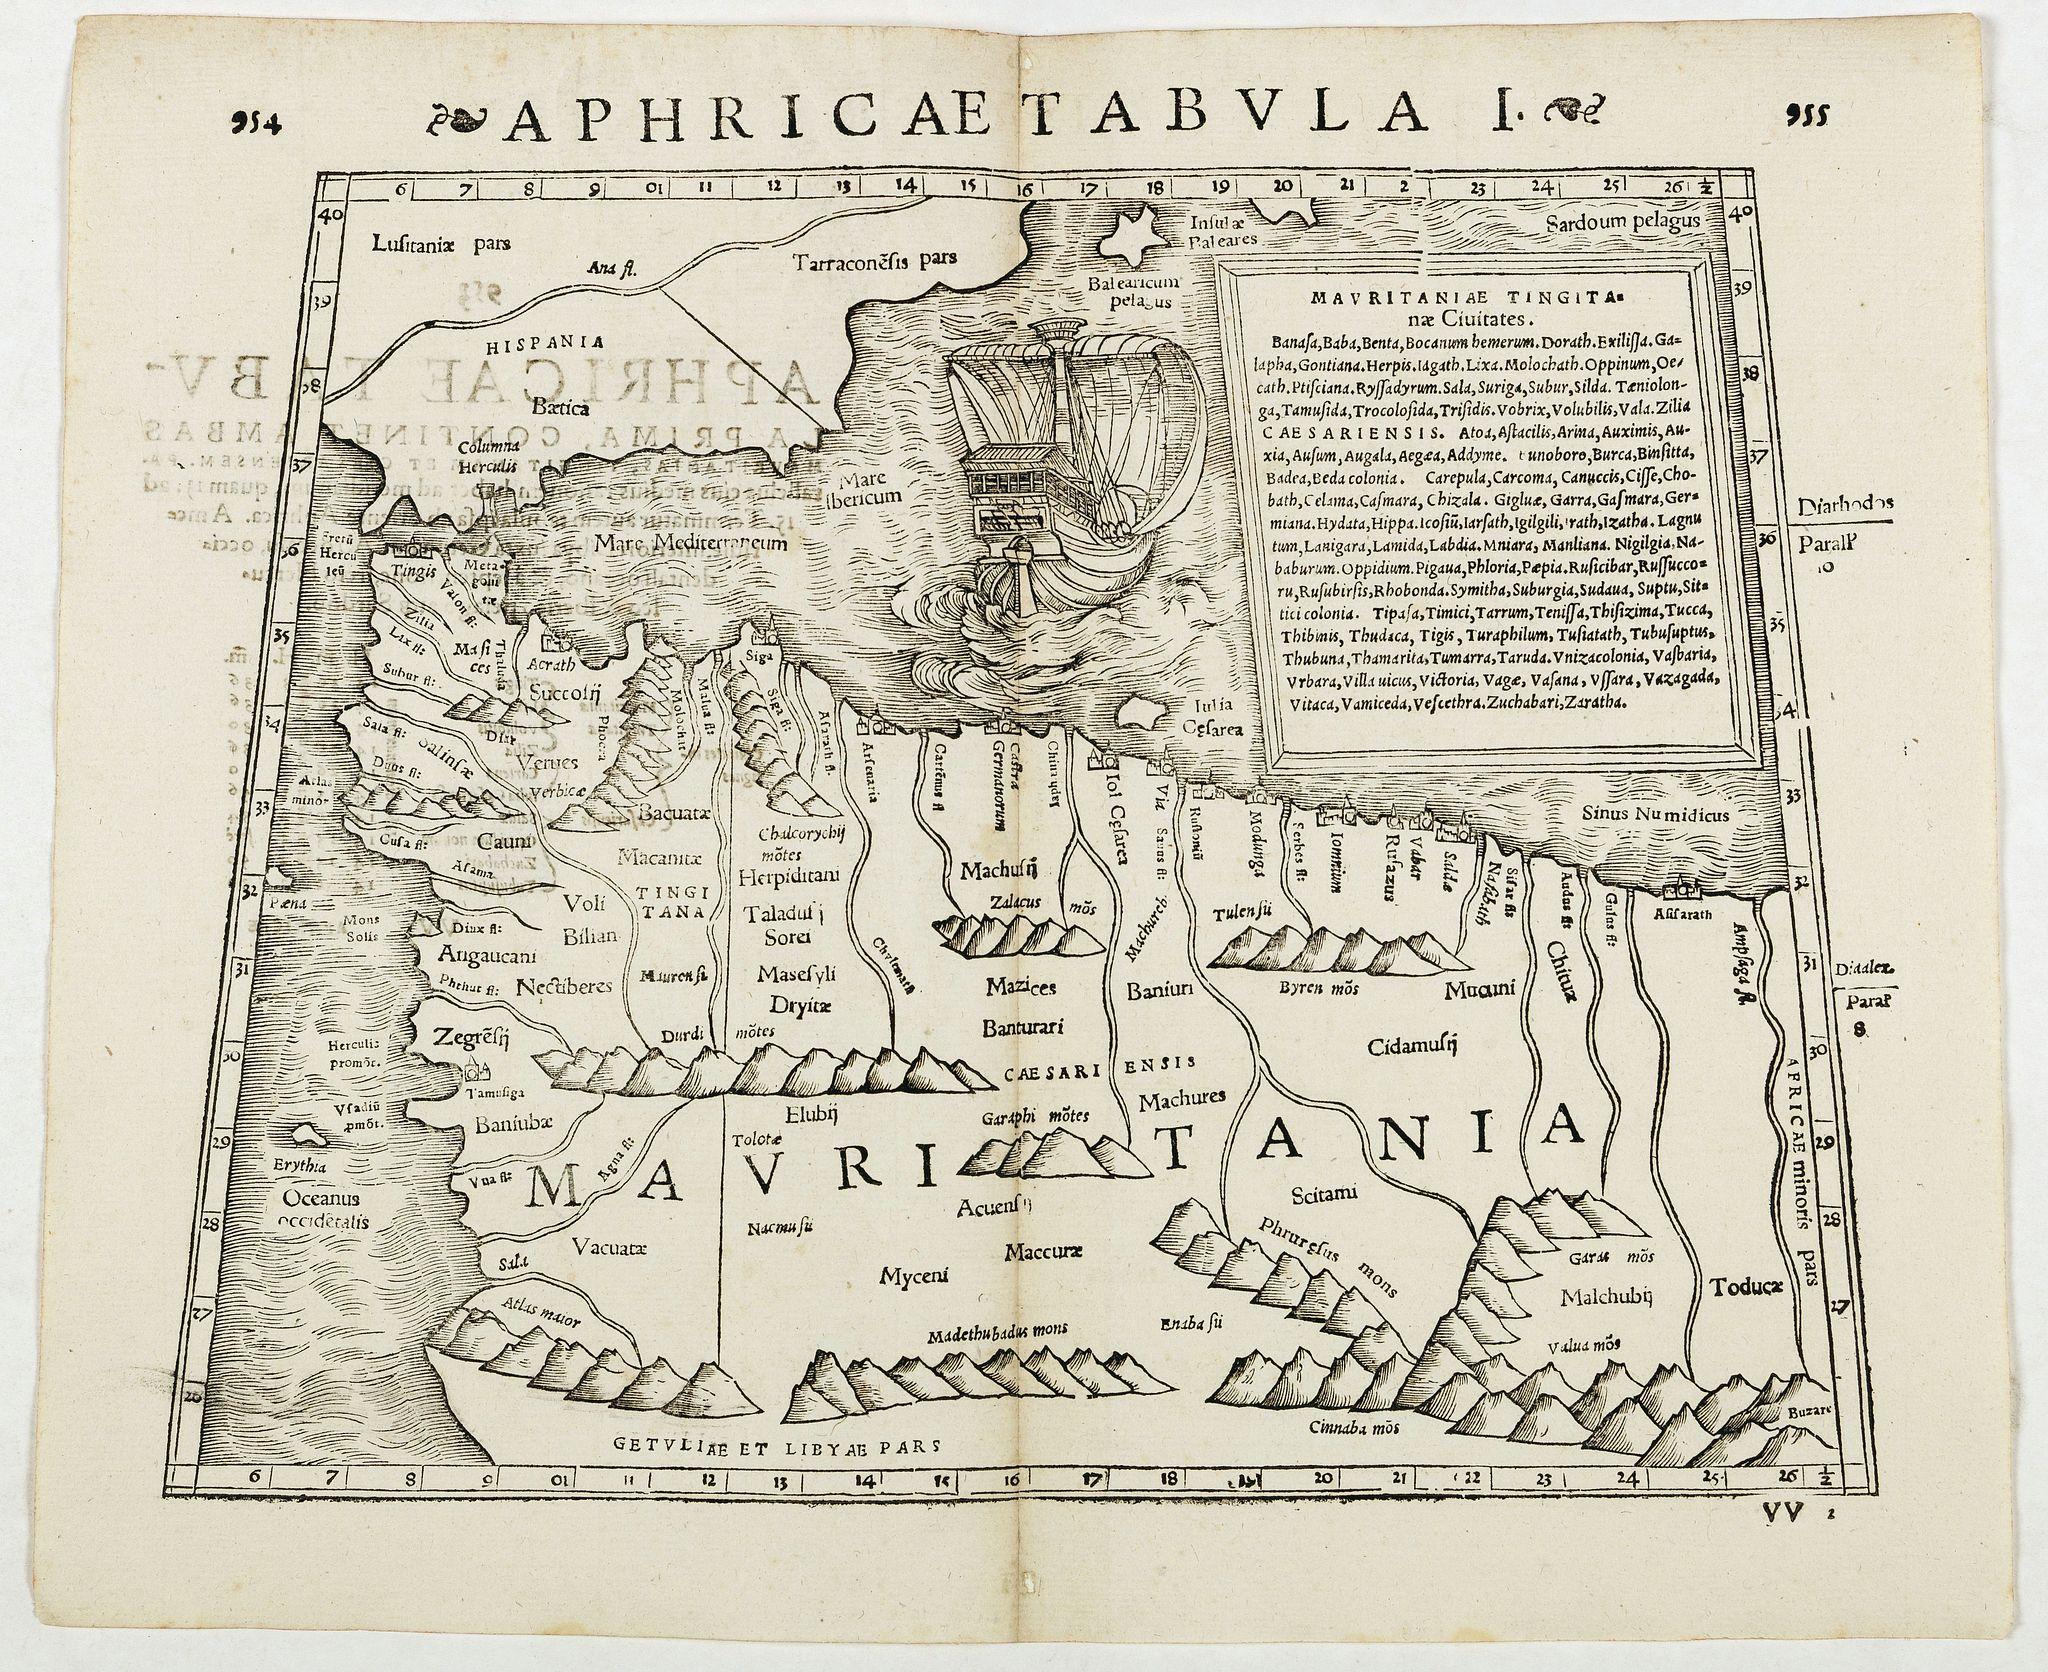 STRABO / MUNSTER, S. -  Aphricae Tabula I.  (Mauritania - present-day Morocco, Algeria, and Tunisia.)